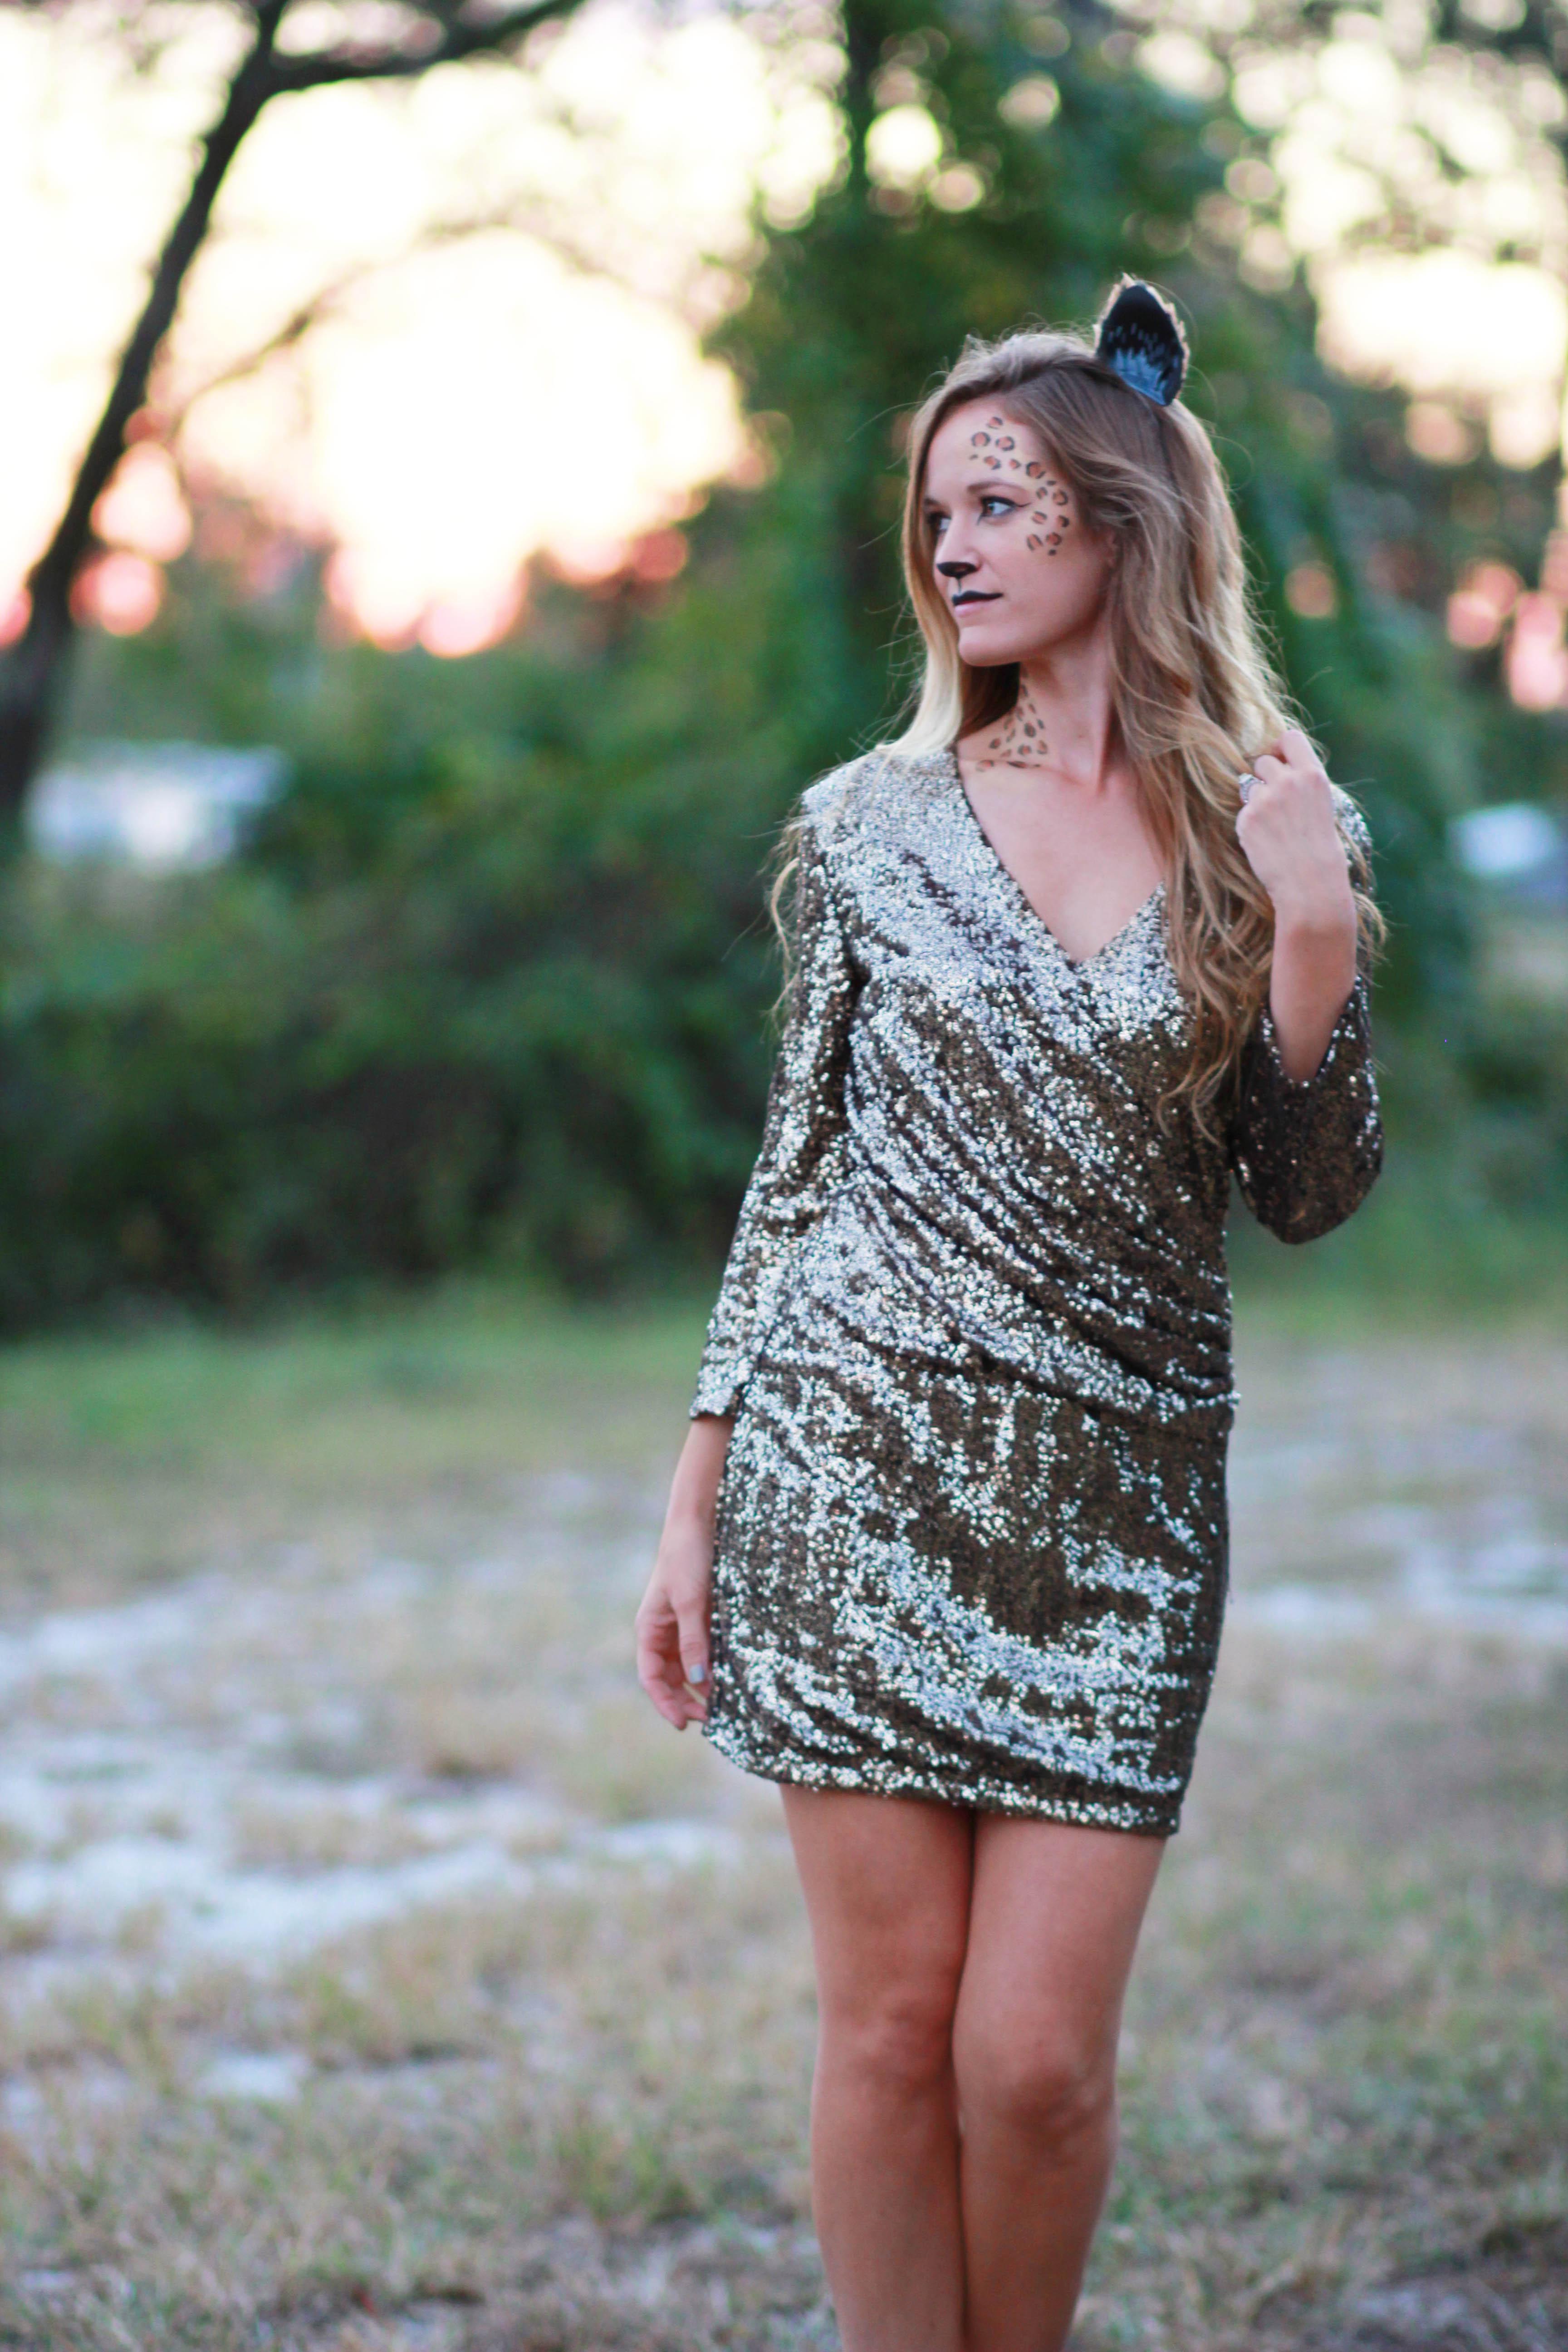 florida fashion blogger last minute cheetah halloween costume